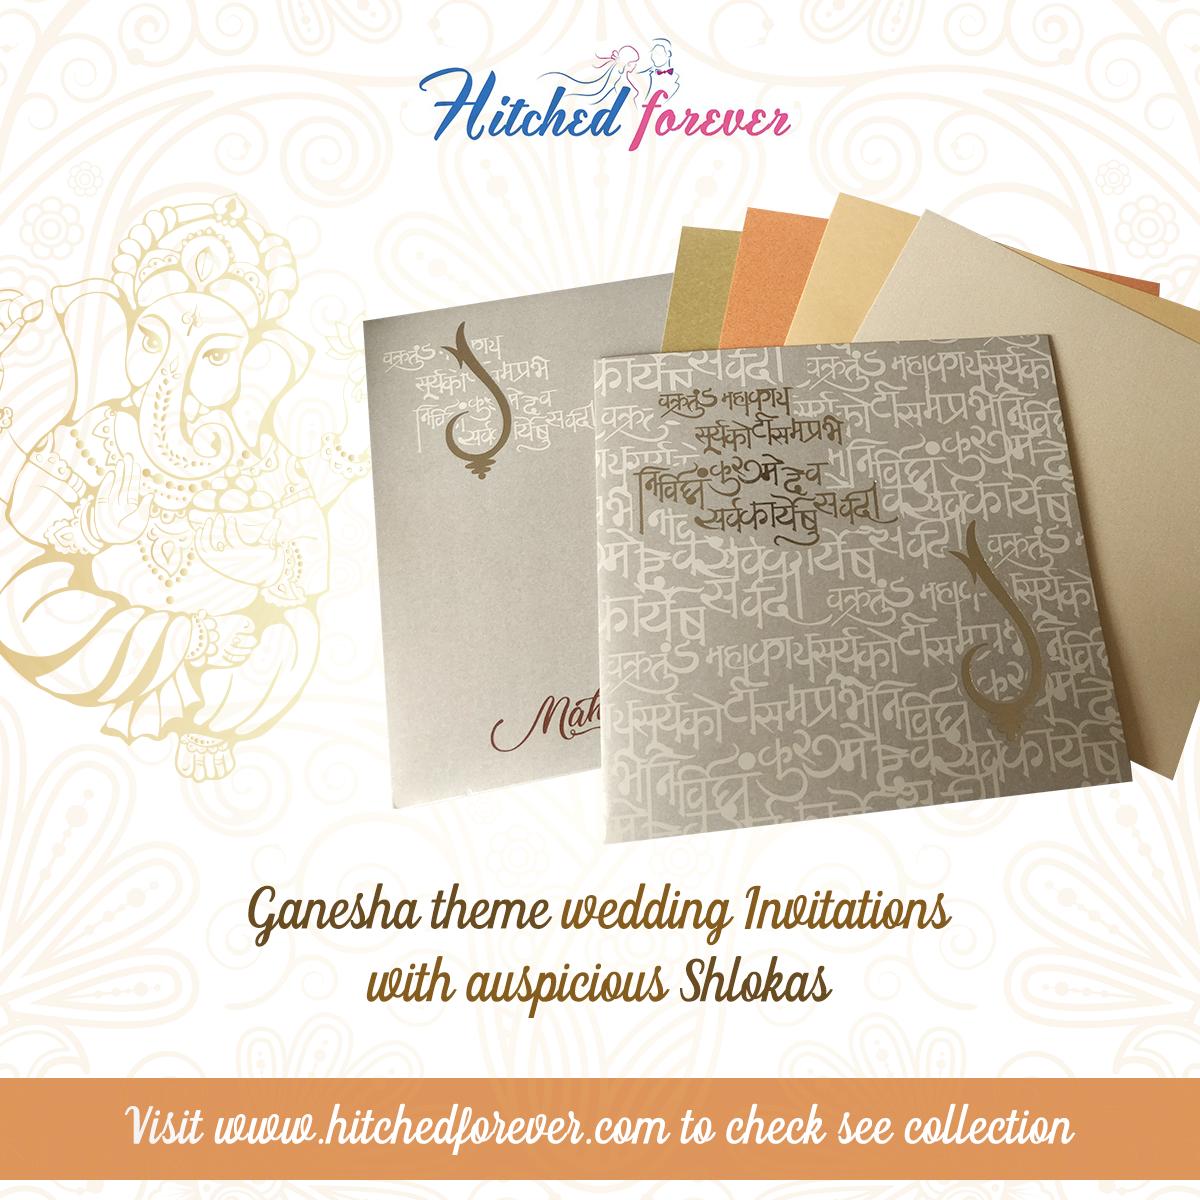 Traditional Ganesha Theme Wedding Invitation Mark The Onset Of Something New With Ble Indian Wedding Invitation Cards Wedding Invitations Online Wedding Cards